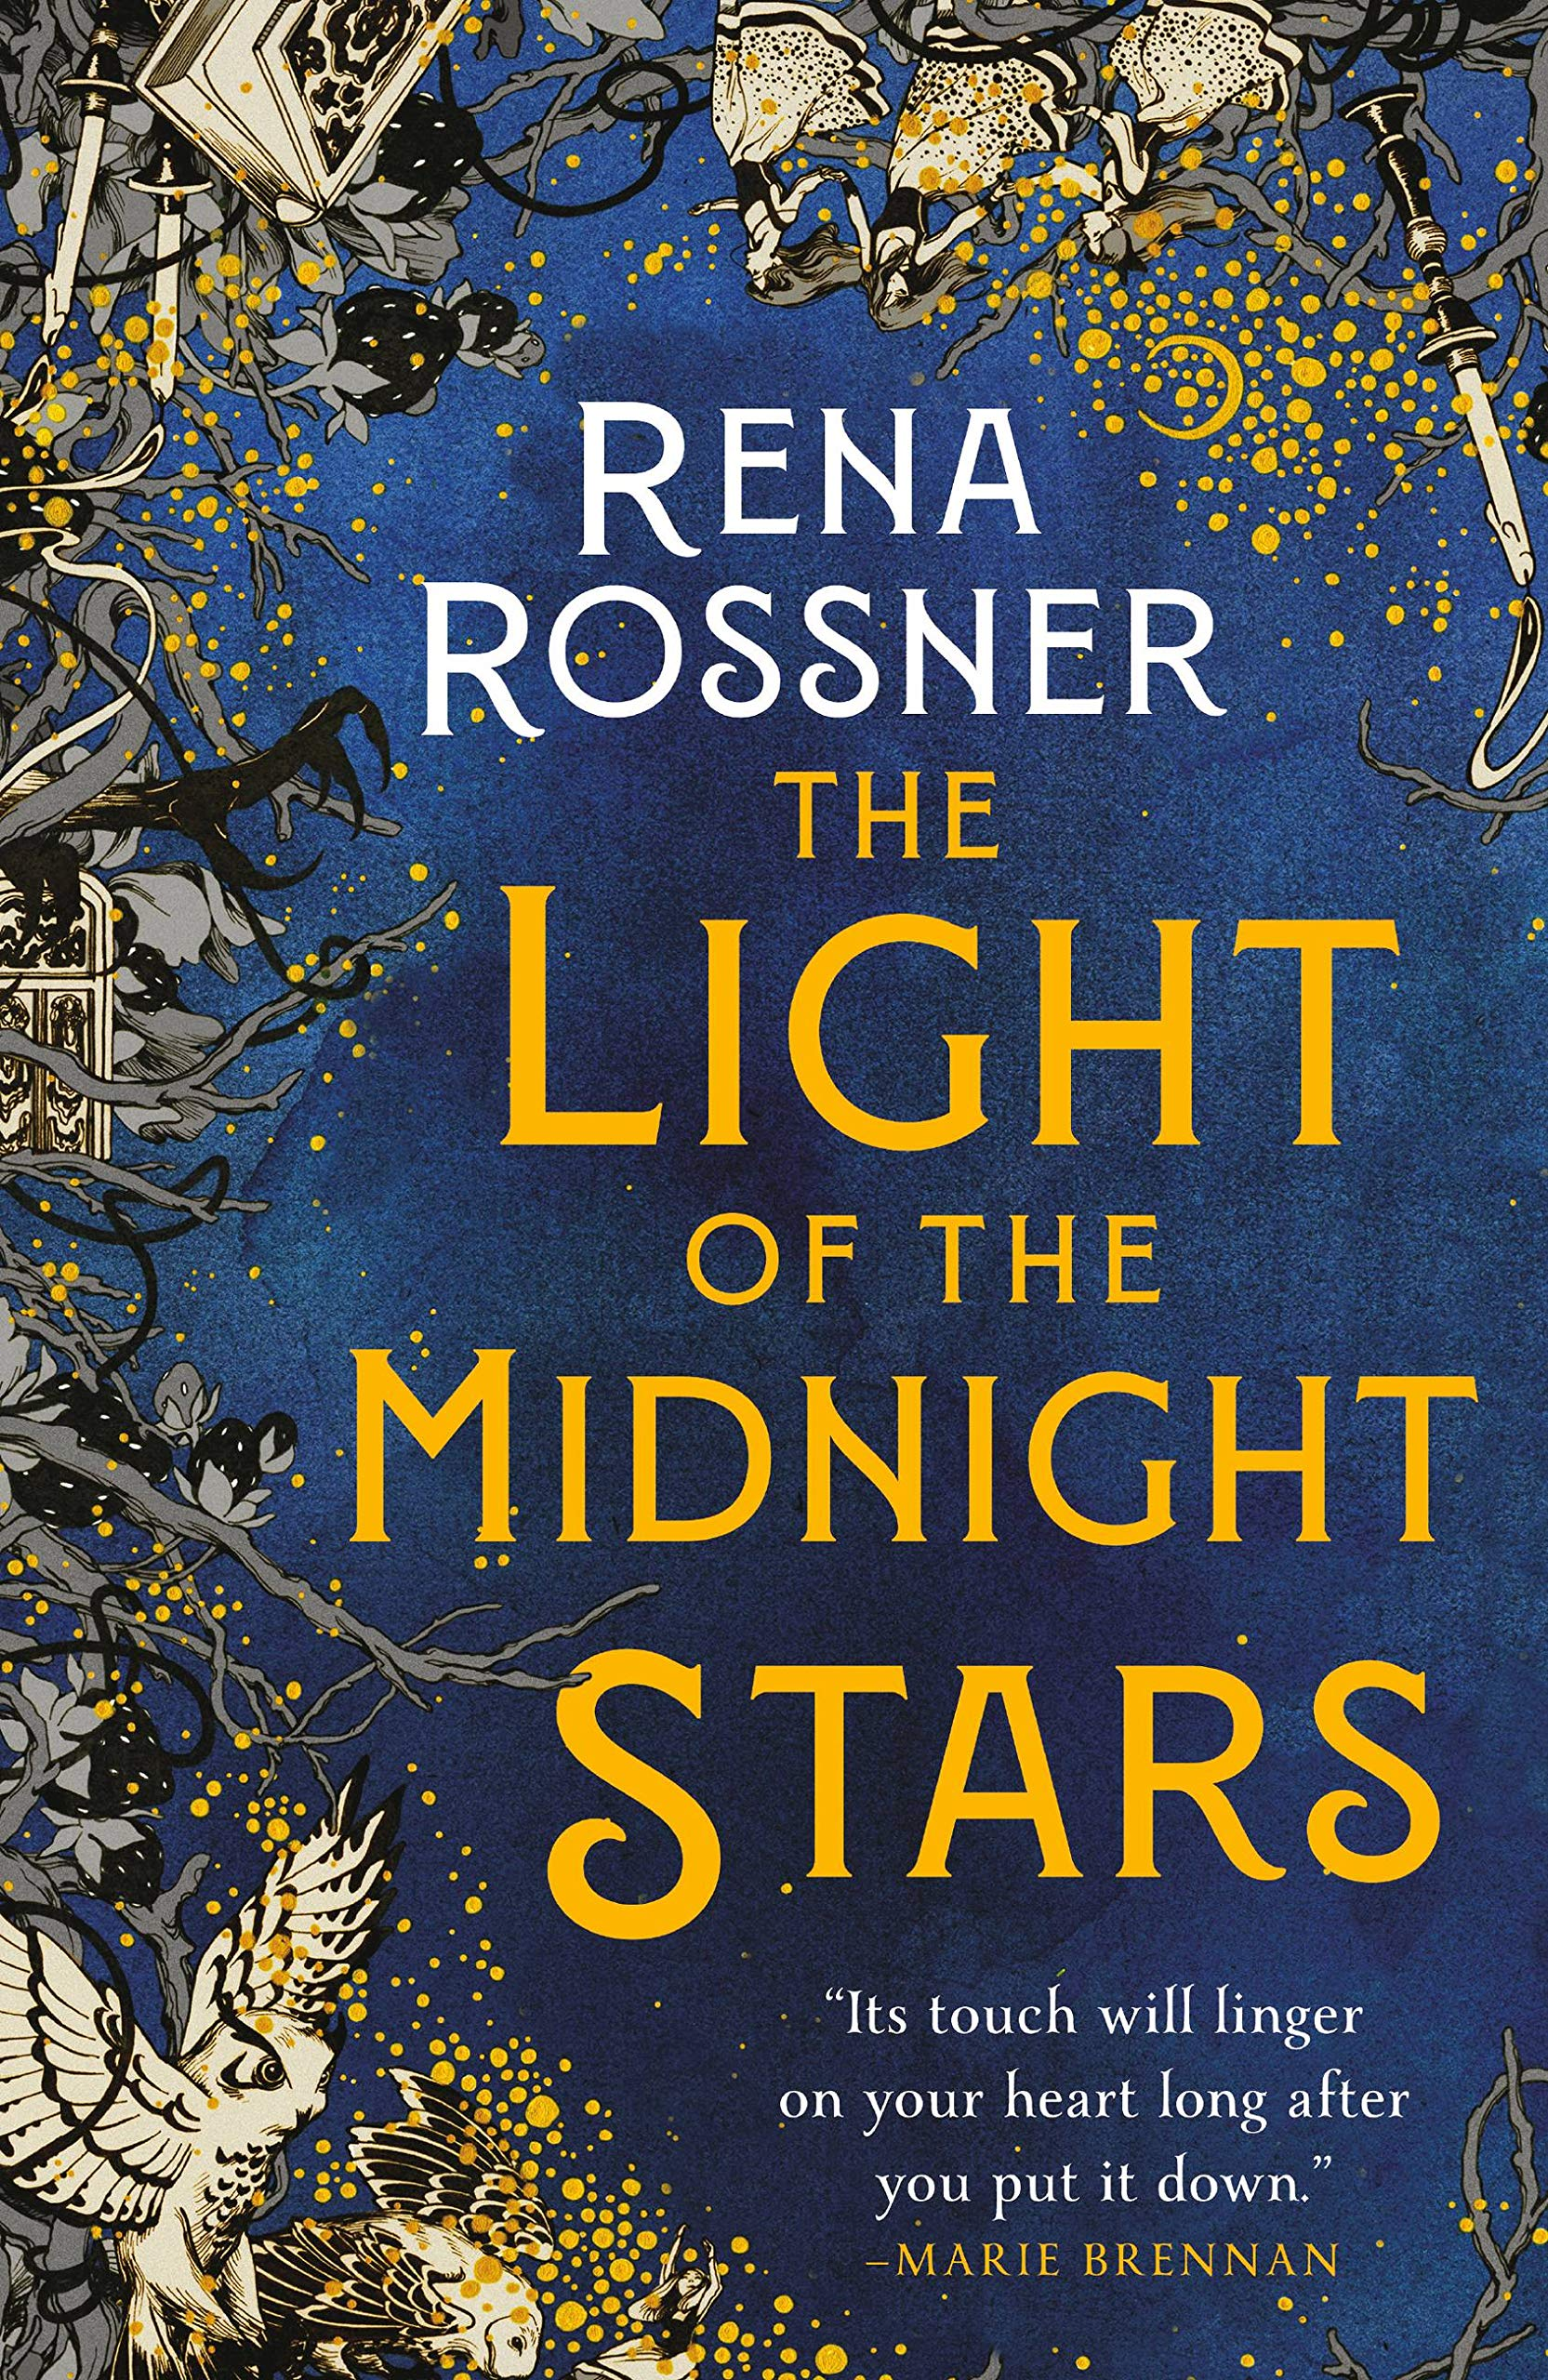 Amazon.com: The Light of the Midnight Stars (9780316483469): Rossner, Rena:  Books